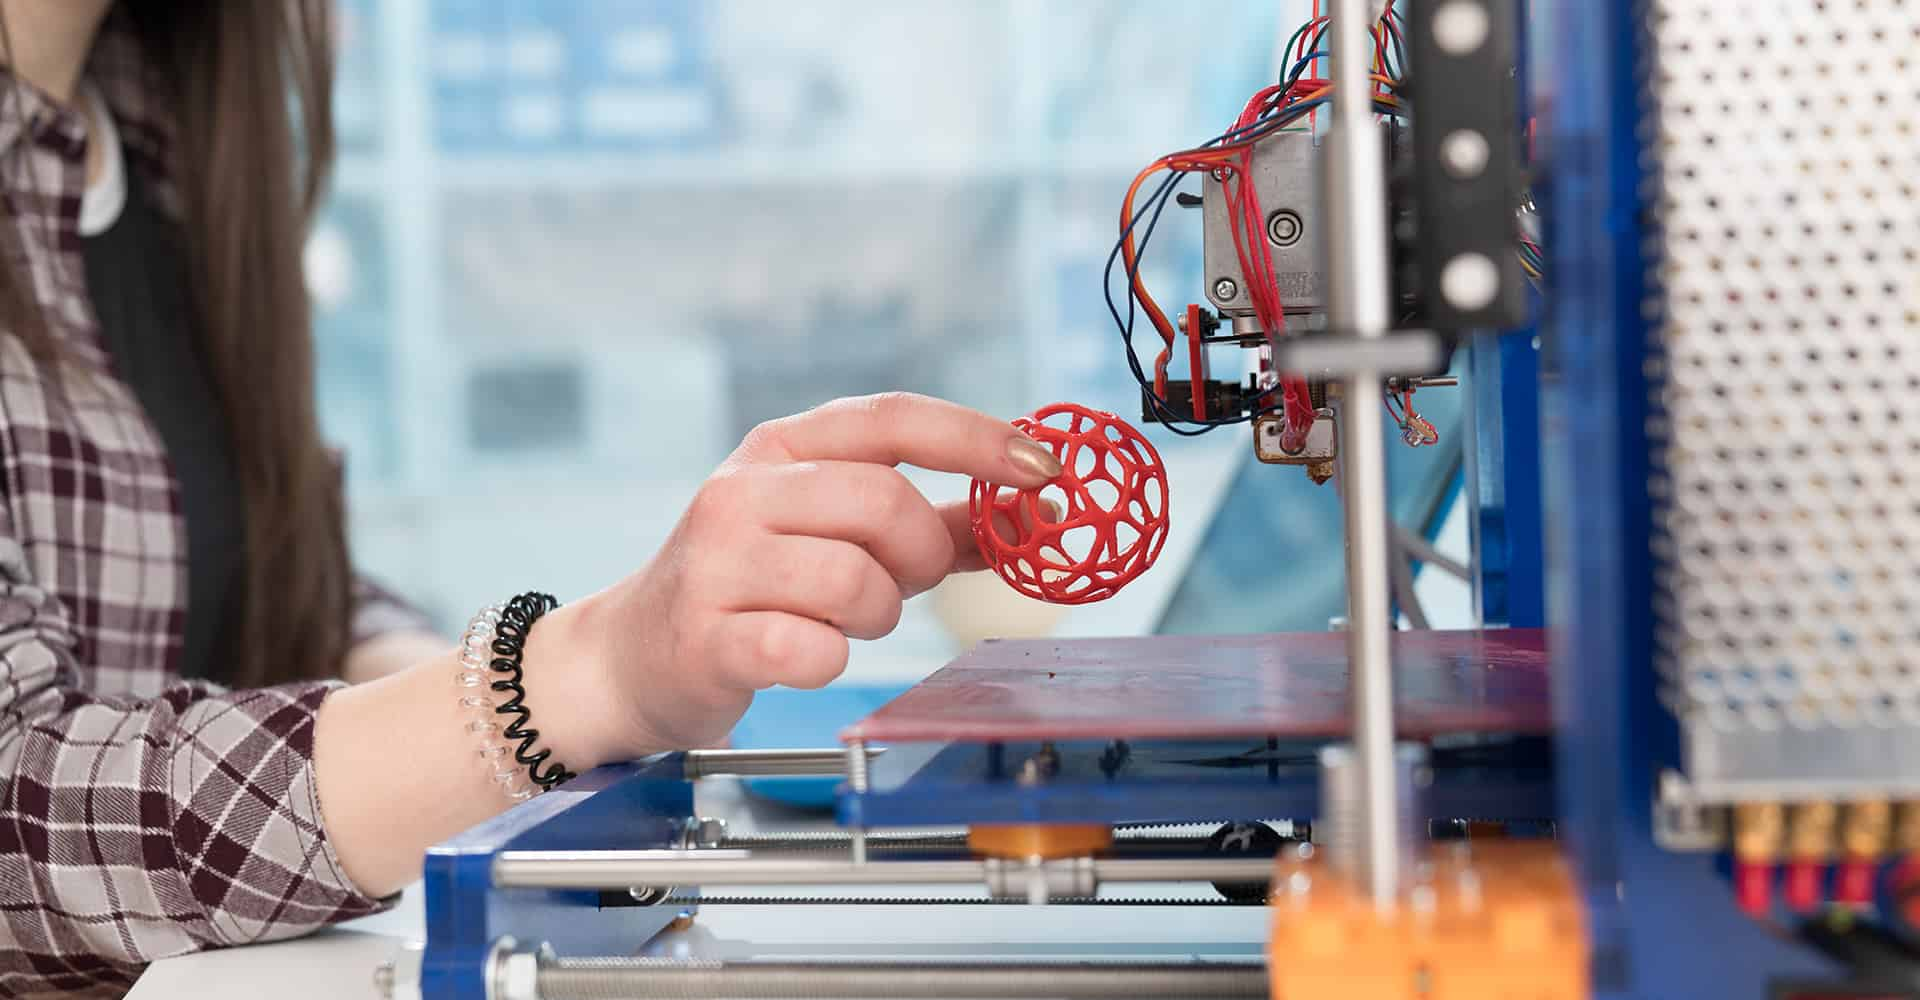 5 Best Dual Extruder 3D Printers (Jan 2021 Review)